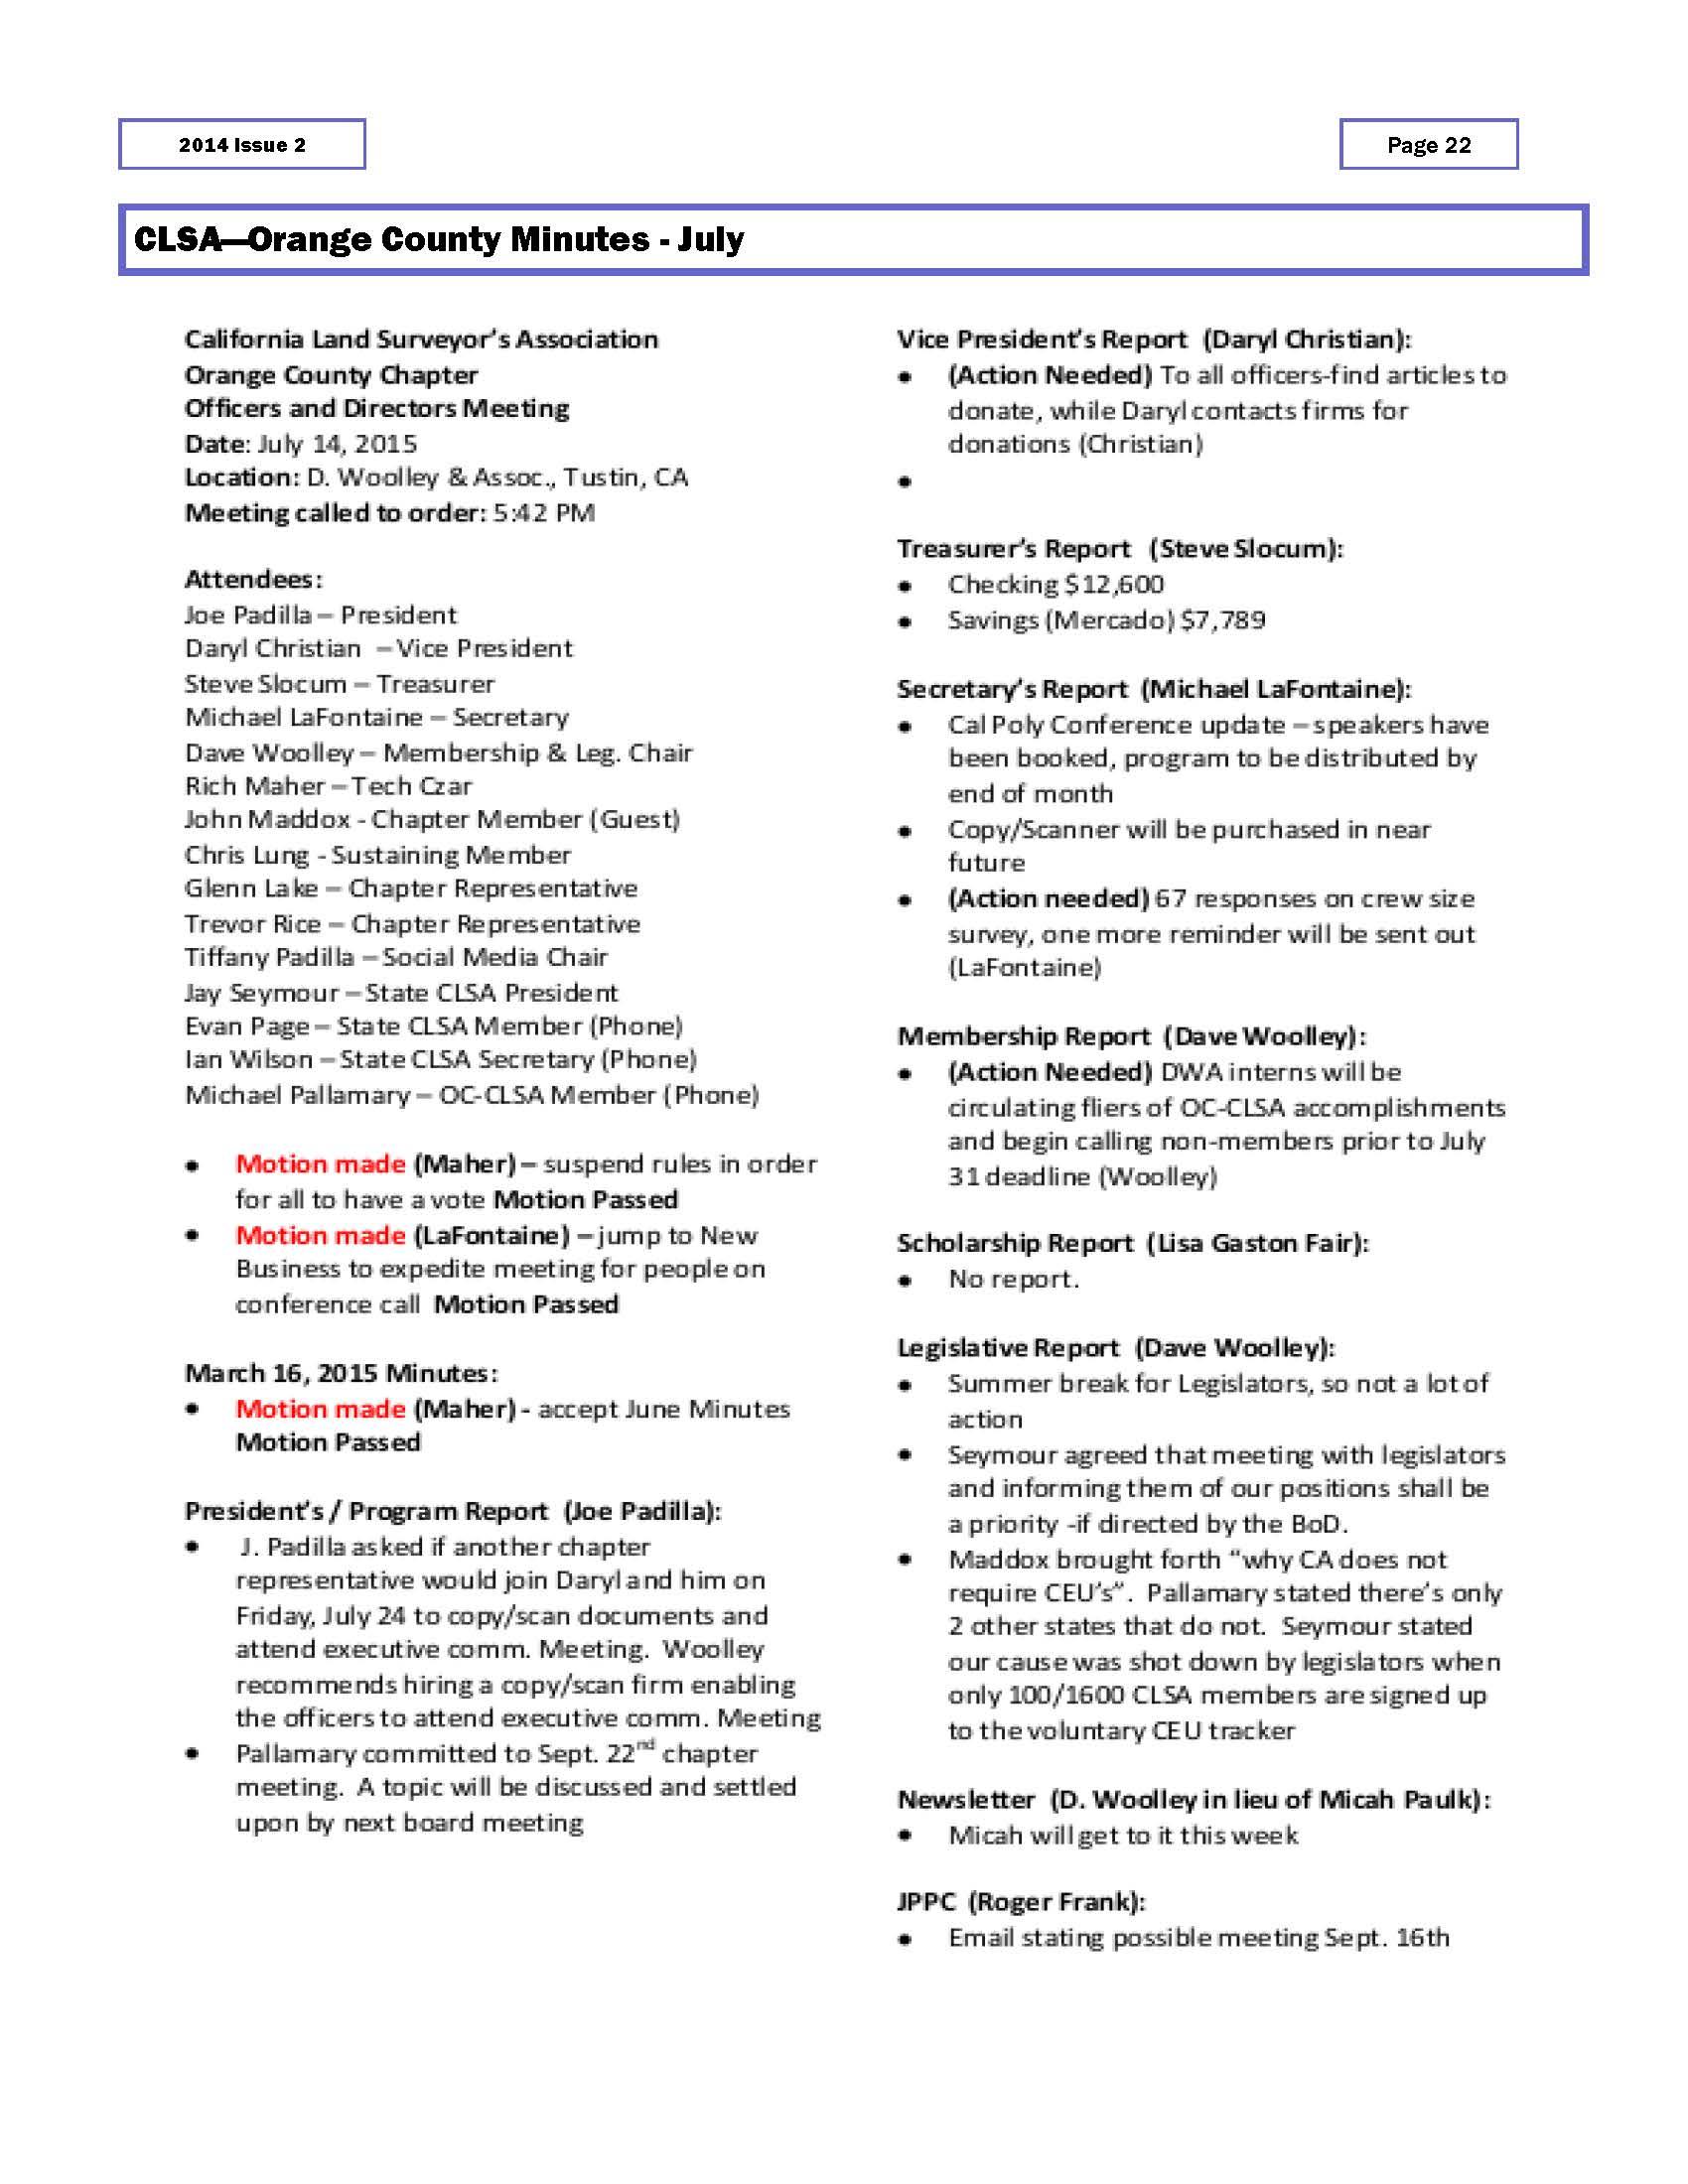 OC-CLSA 082015 Newsletter_Page_28.jpg